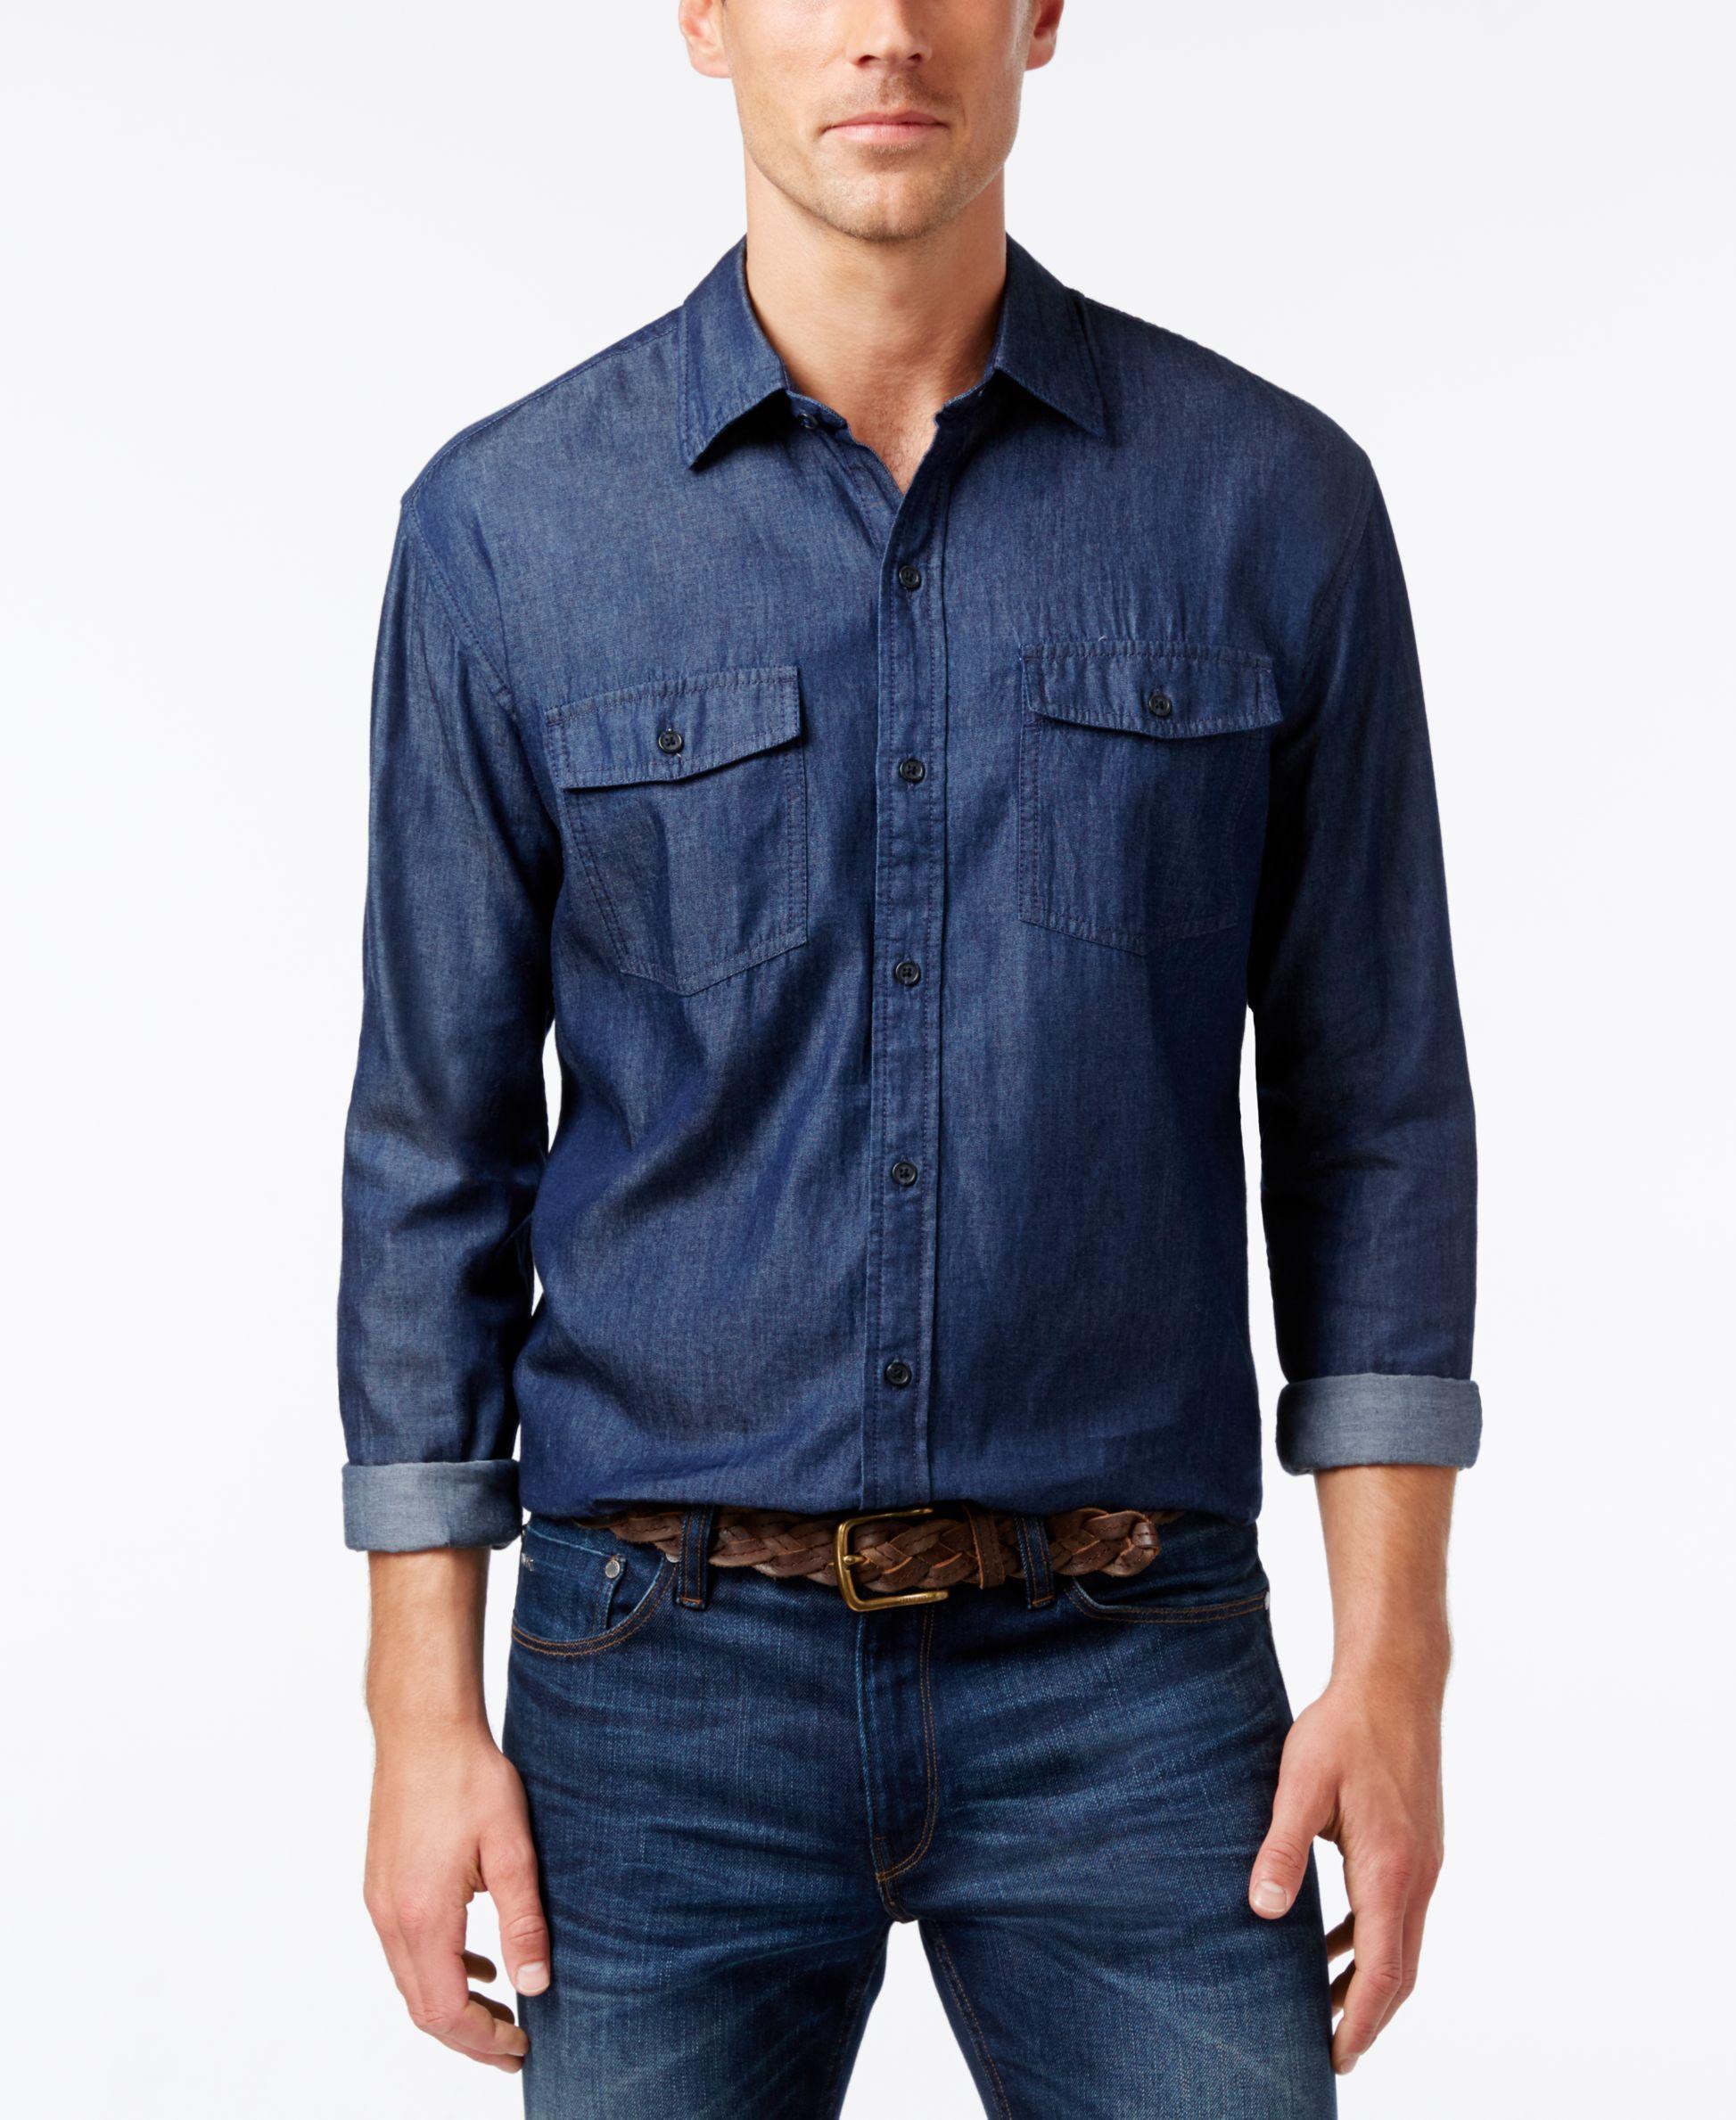 Navy blue flannel shirt womens  Cutter u Buck Menus Big u Tall Indigo Denim Twill Shirt  Products